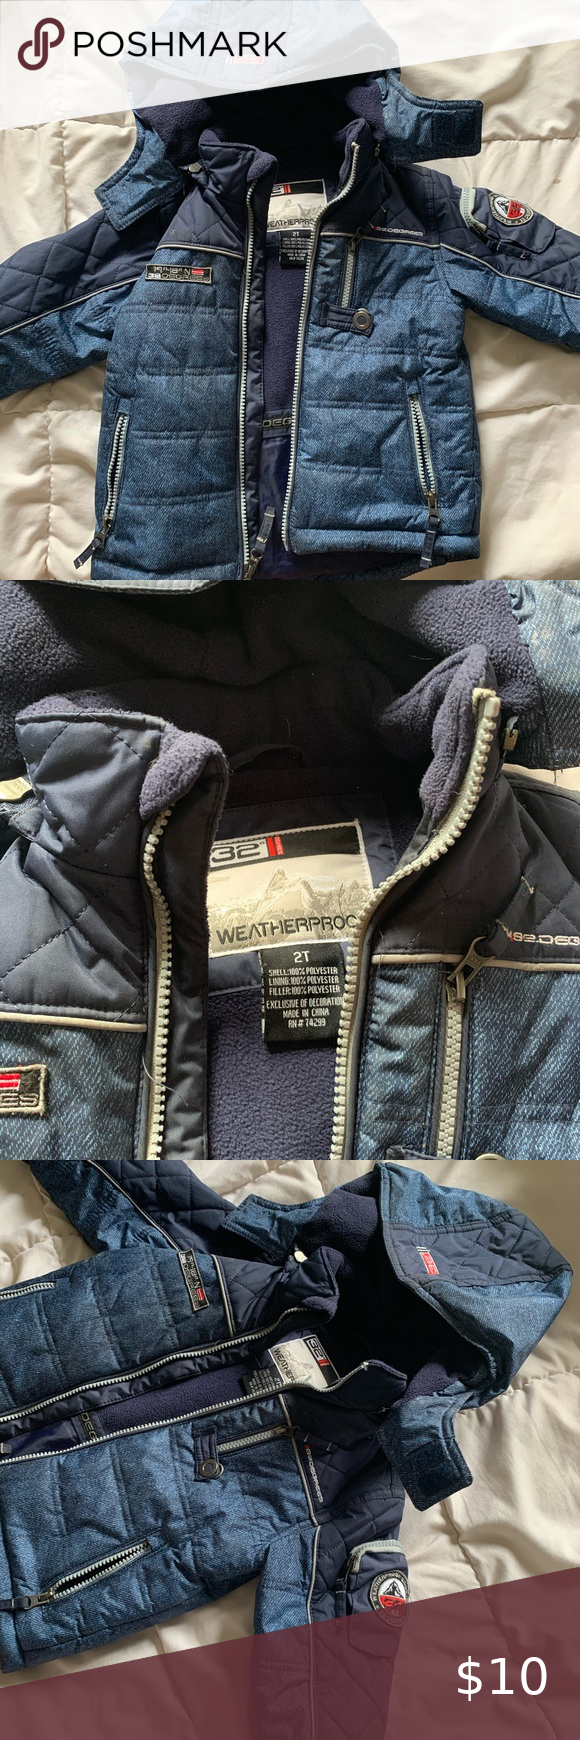 Boys Winter Coat Size 2t Boys Winter Coats Winter Coat Weatherproof Jacket [ 1740 x 580 Pixel ]